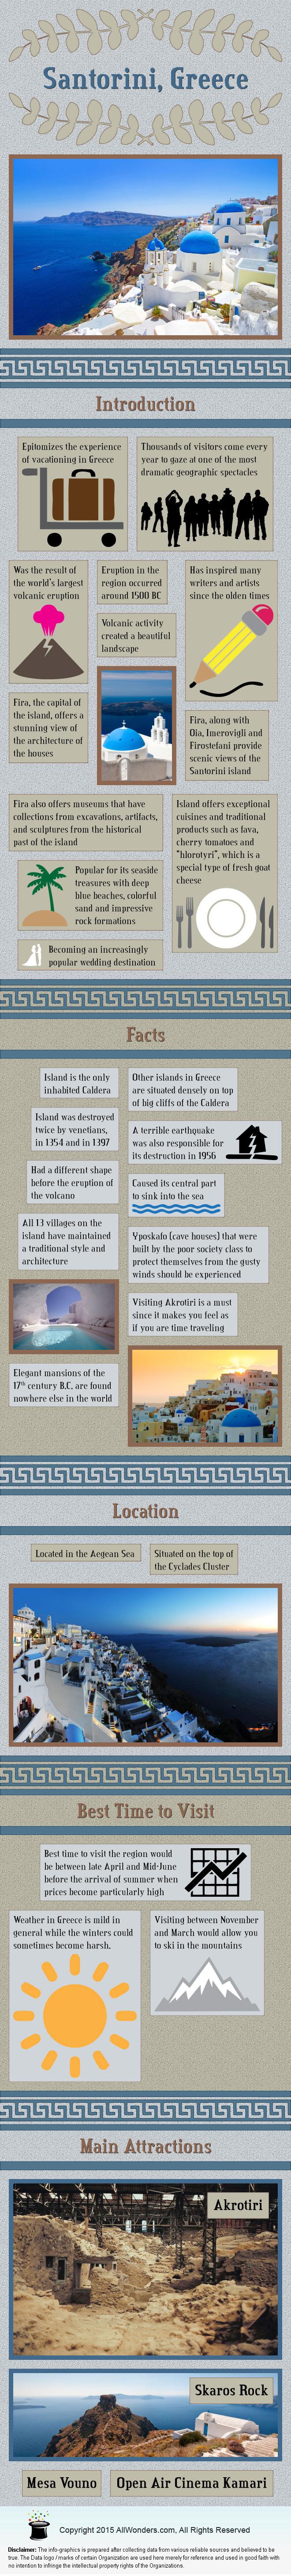 Santorini Island, Greece - Facts & Infographic